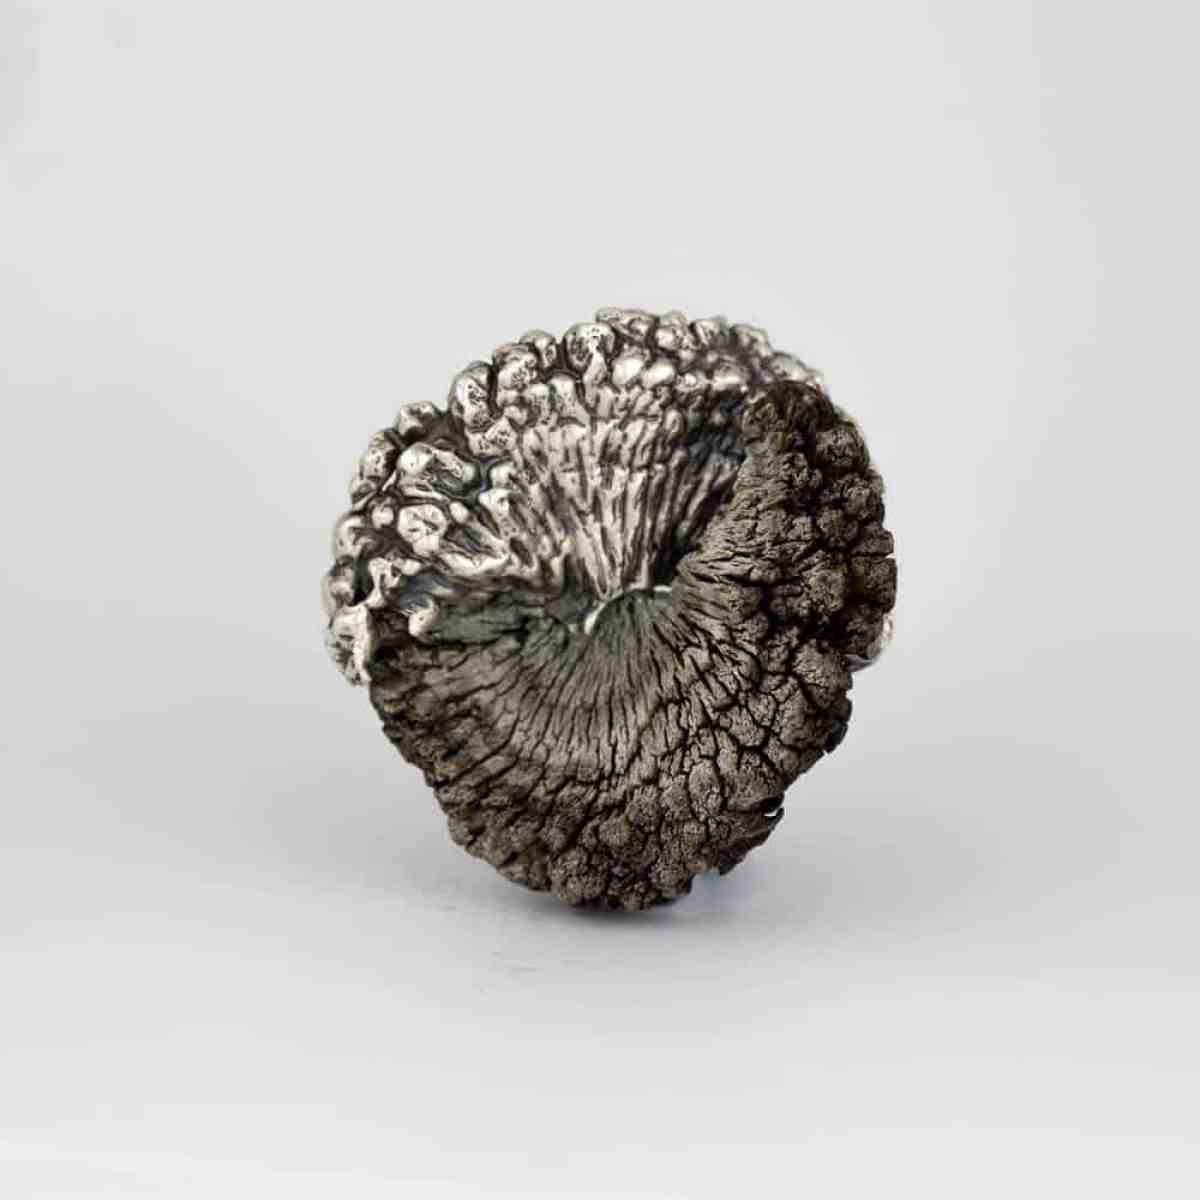 Marisa Molin, Kelp Track Wandering (After), Sterling silver, Kelp, stainless steel brooch, 5 x 5.3 x 2.1cm, photo: Marisa Molin, made in King Island, Tasmania